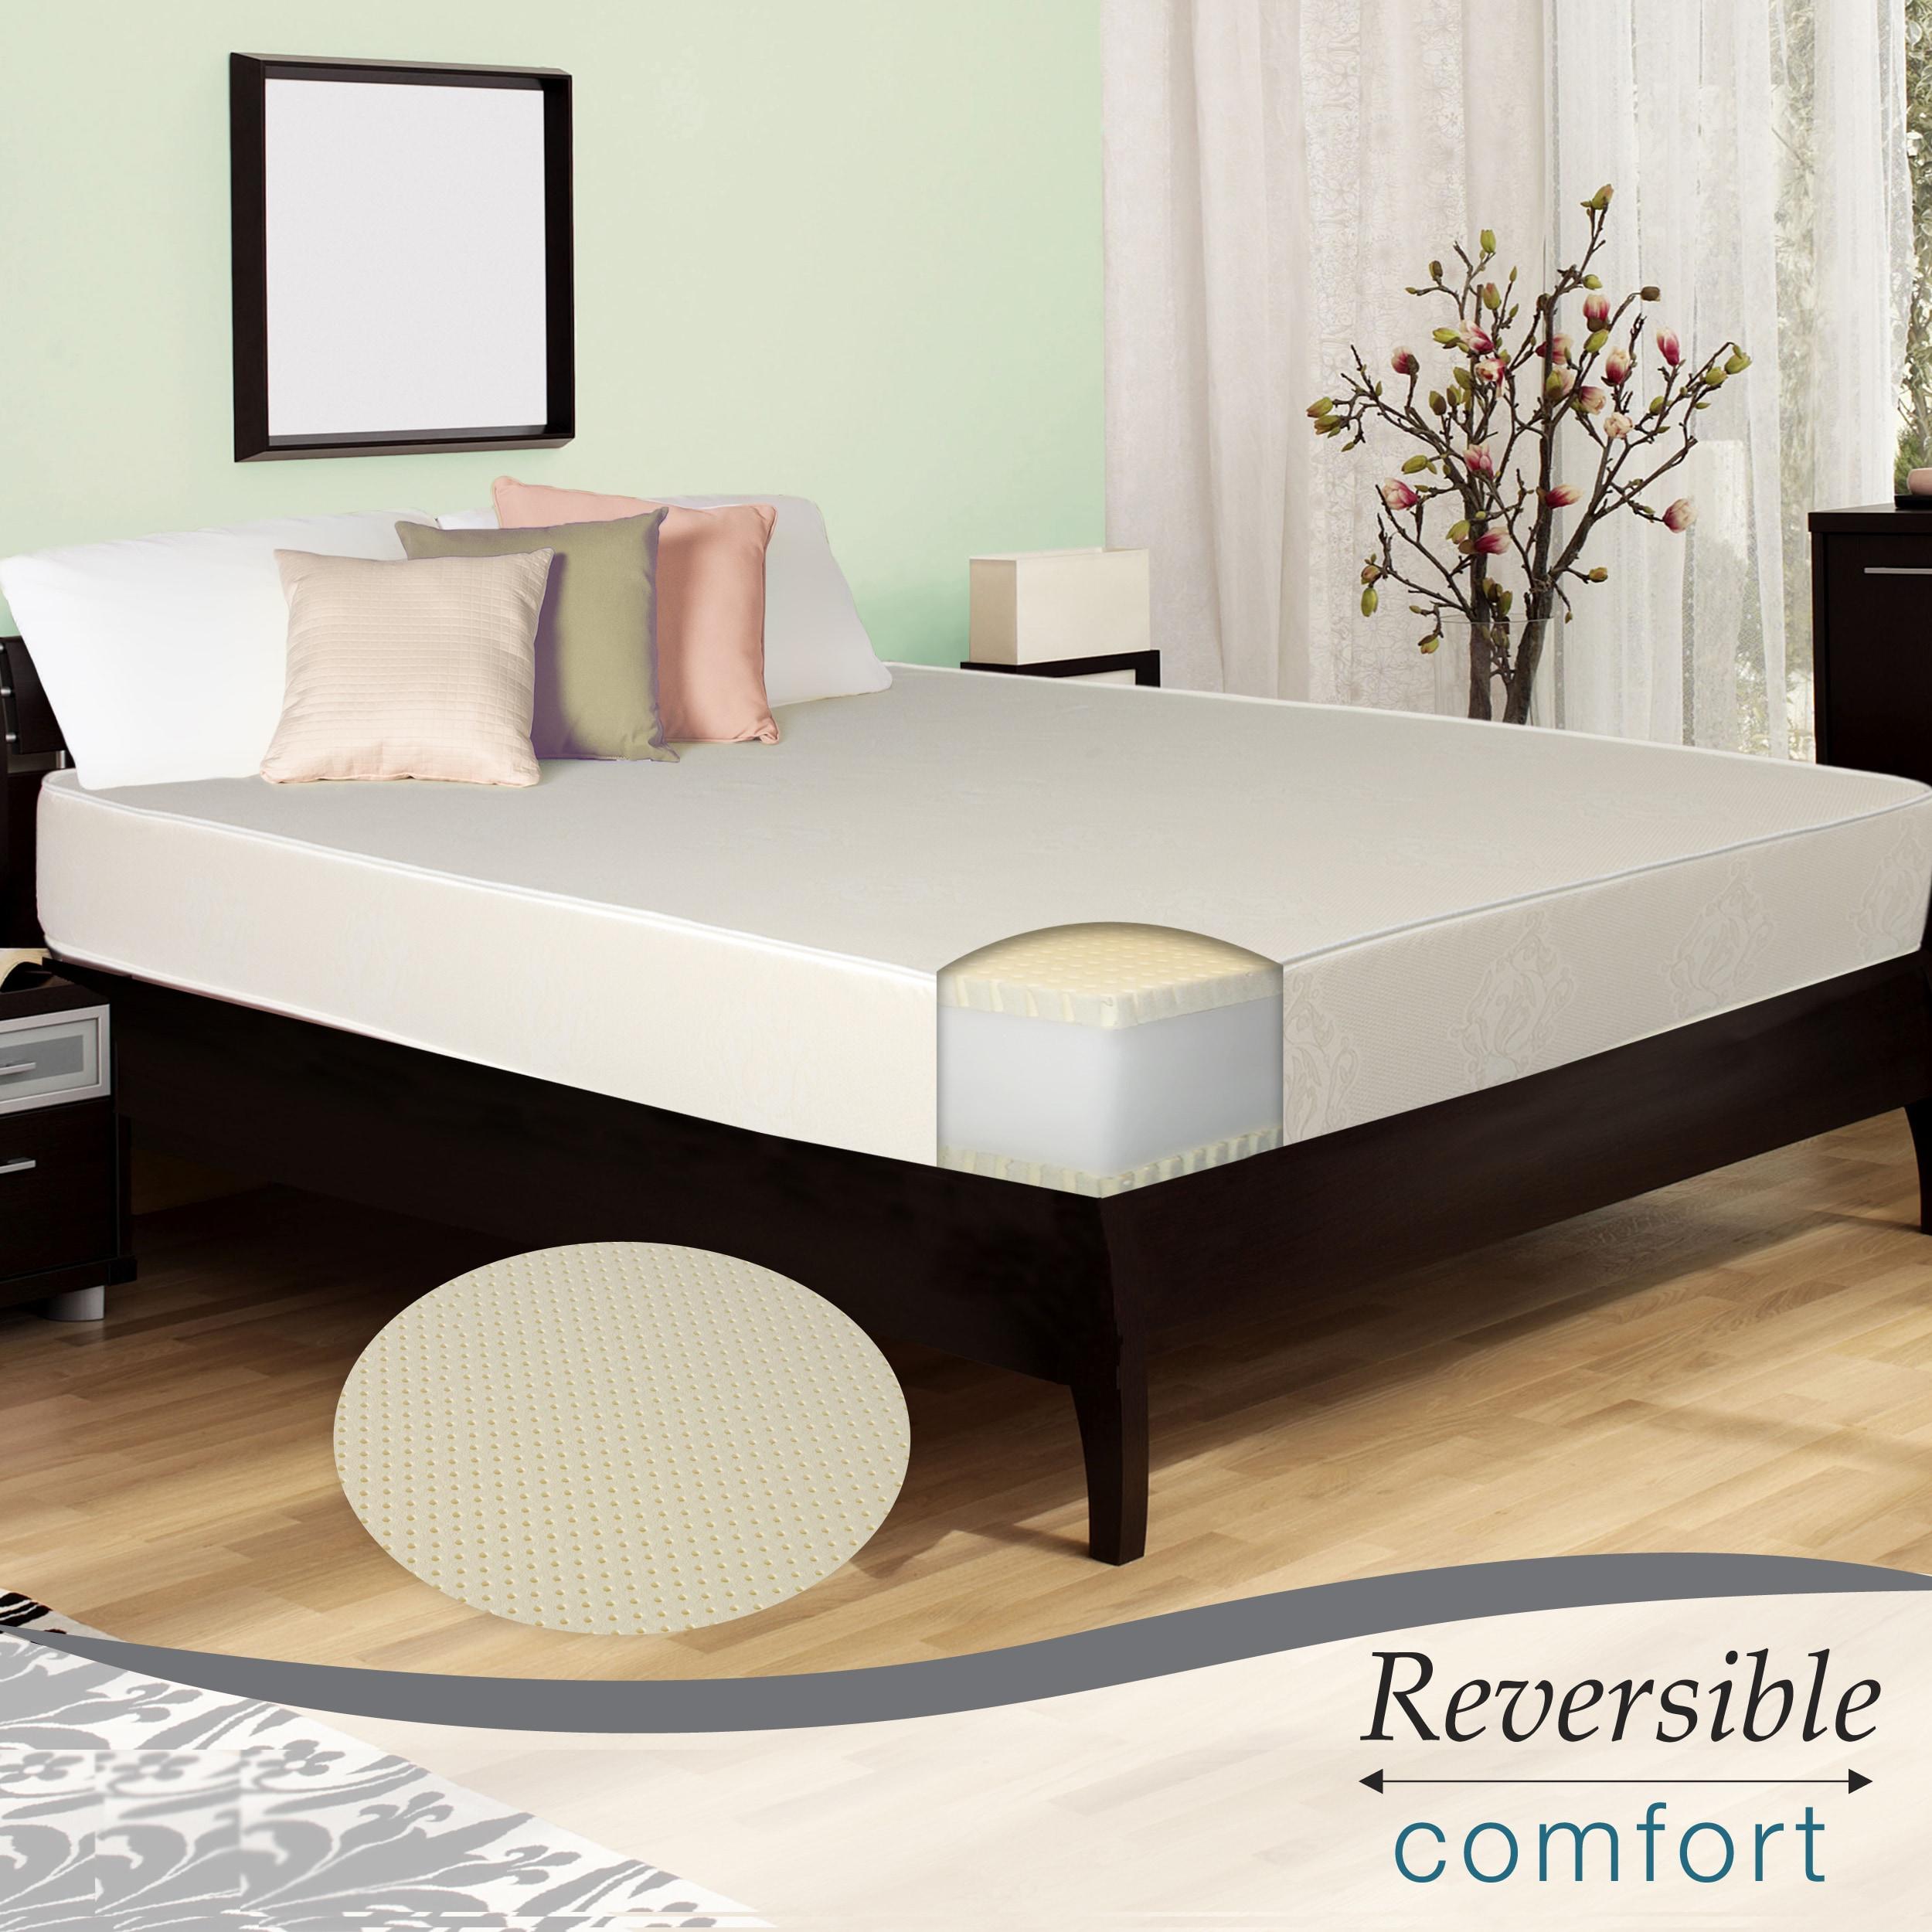 Select Luxury Reversible E.C.O. Latex Foam Medium Firm 10-inch Queen-size Mattress